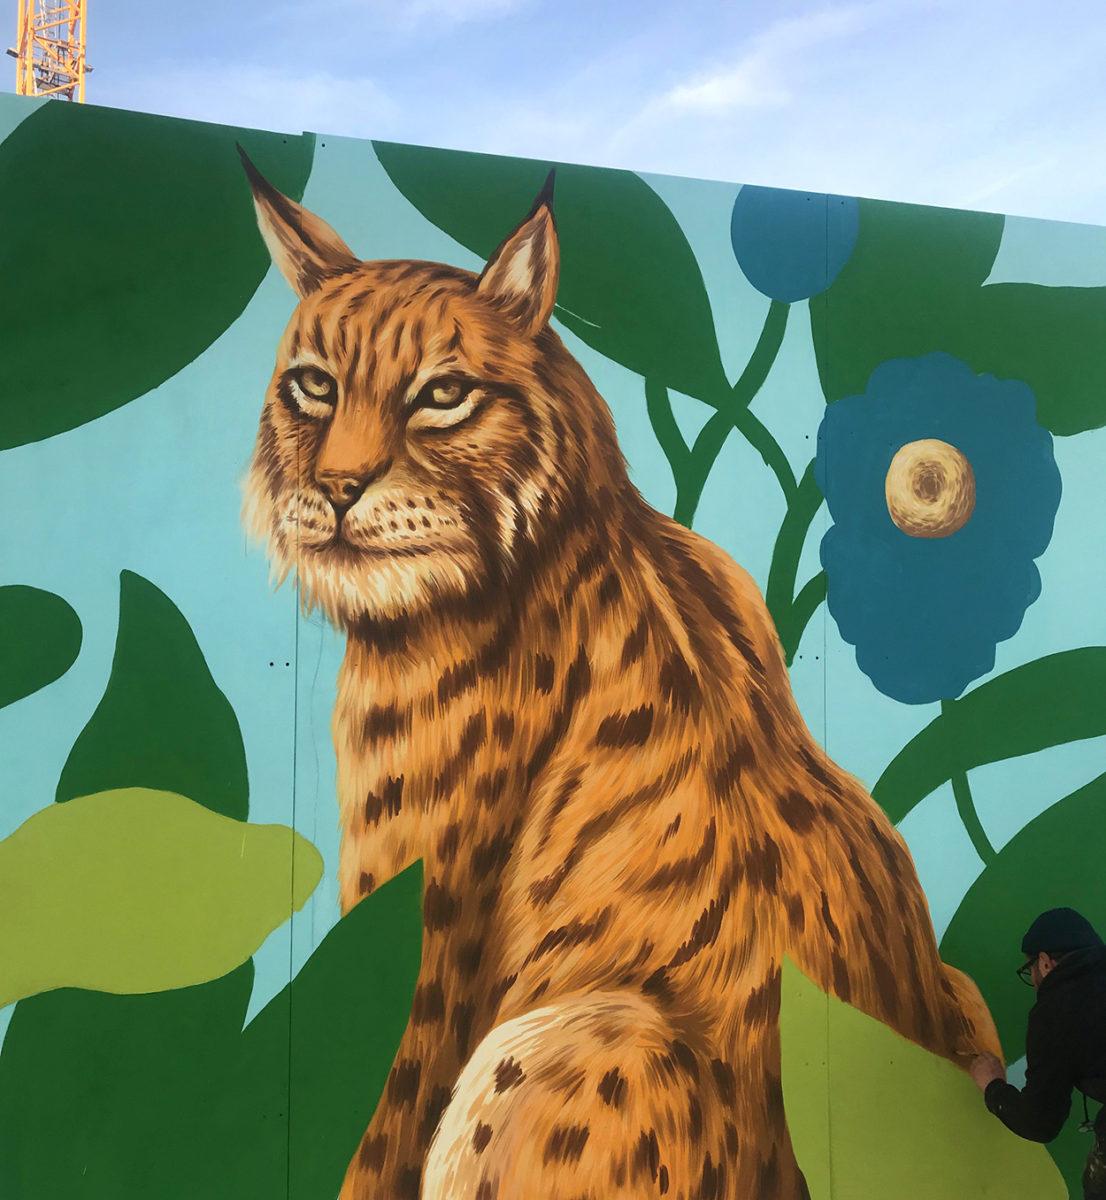 arturbain murales quai 36 Saddo1 - Quai 36 invite des street artistes à colorer halls de gare et palissades de chantiers